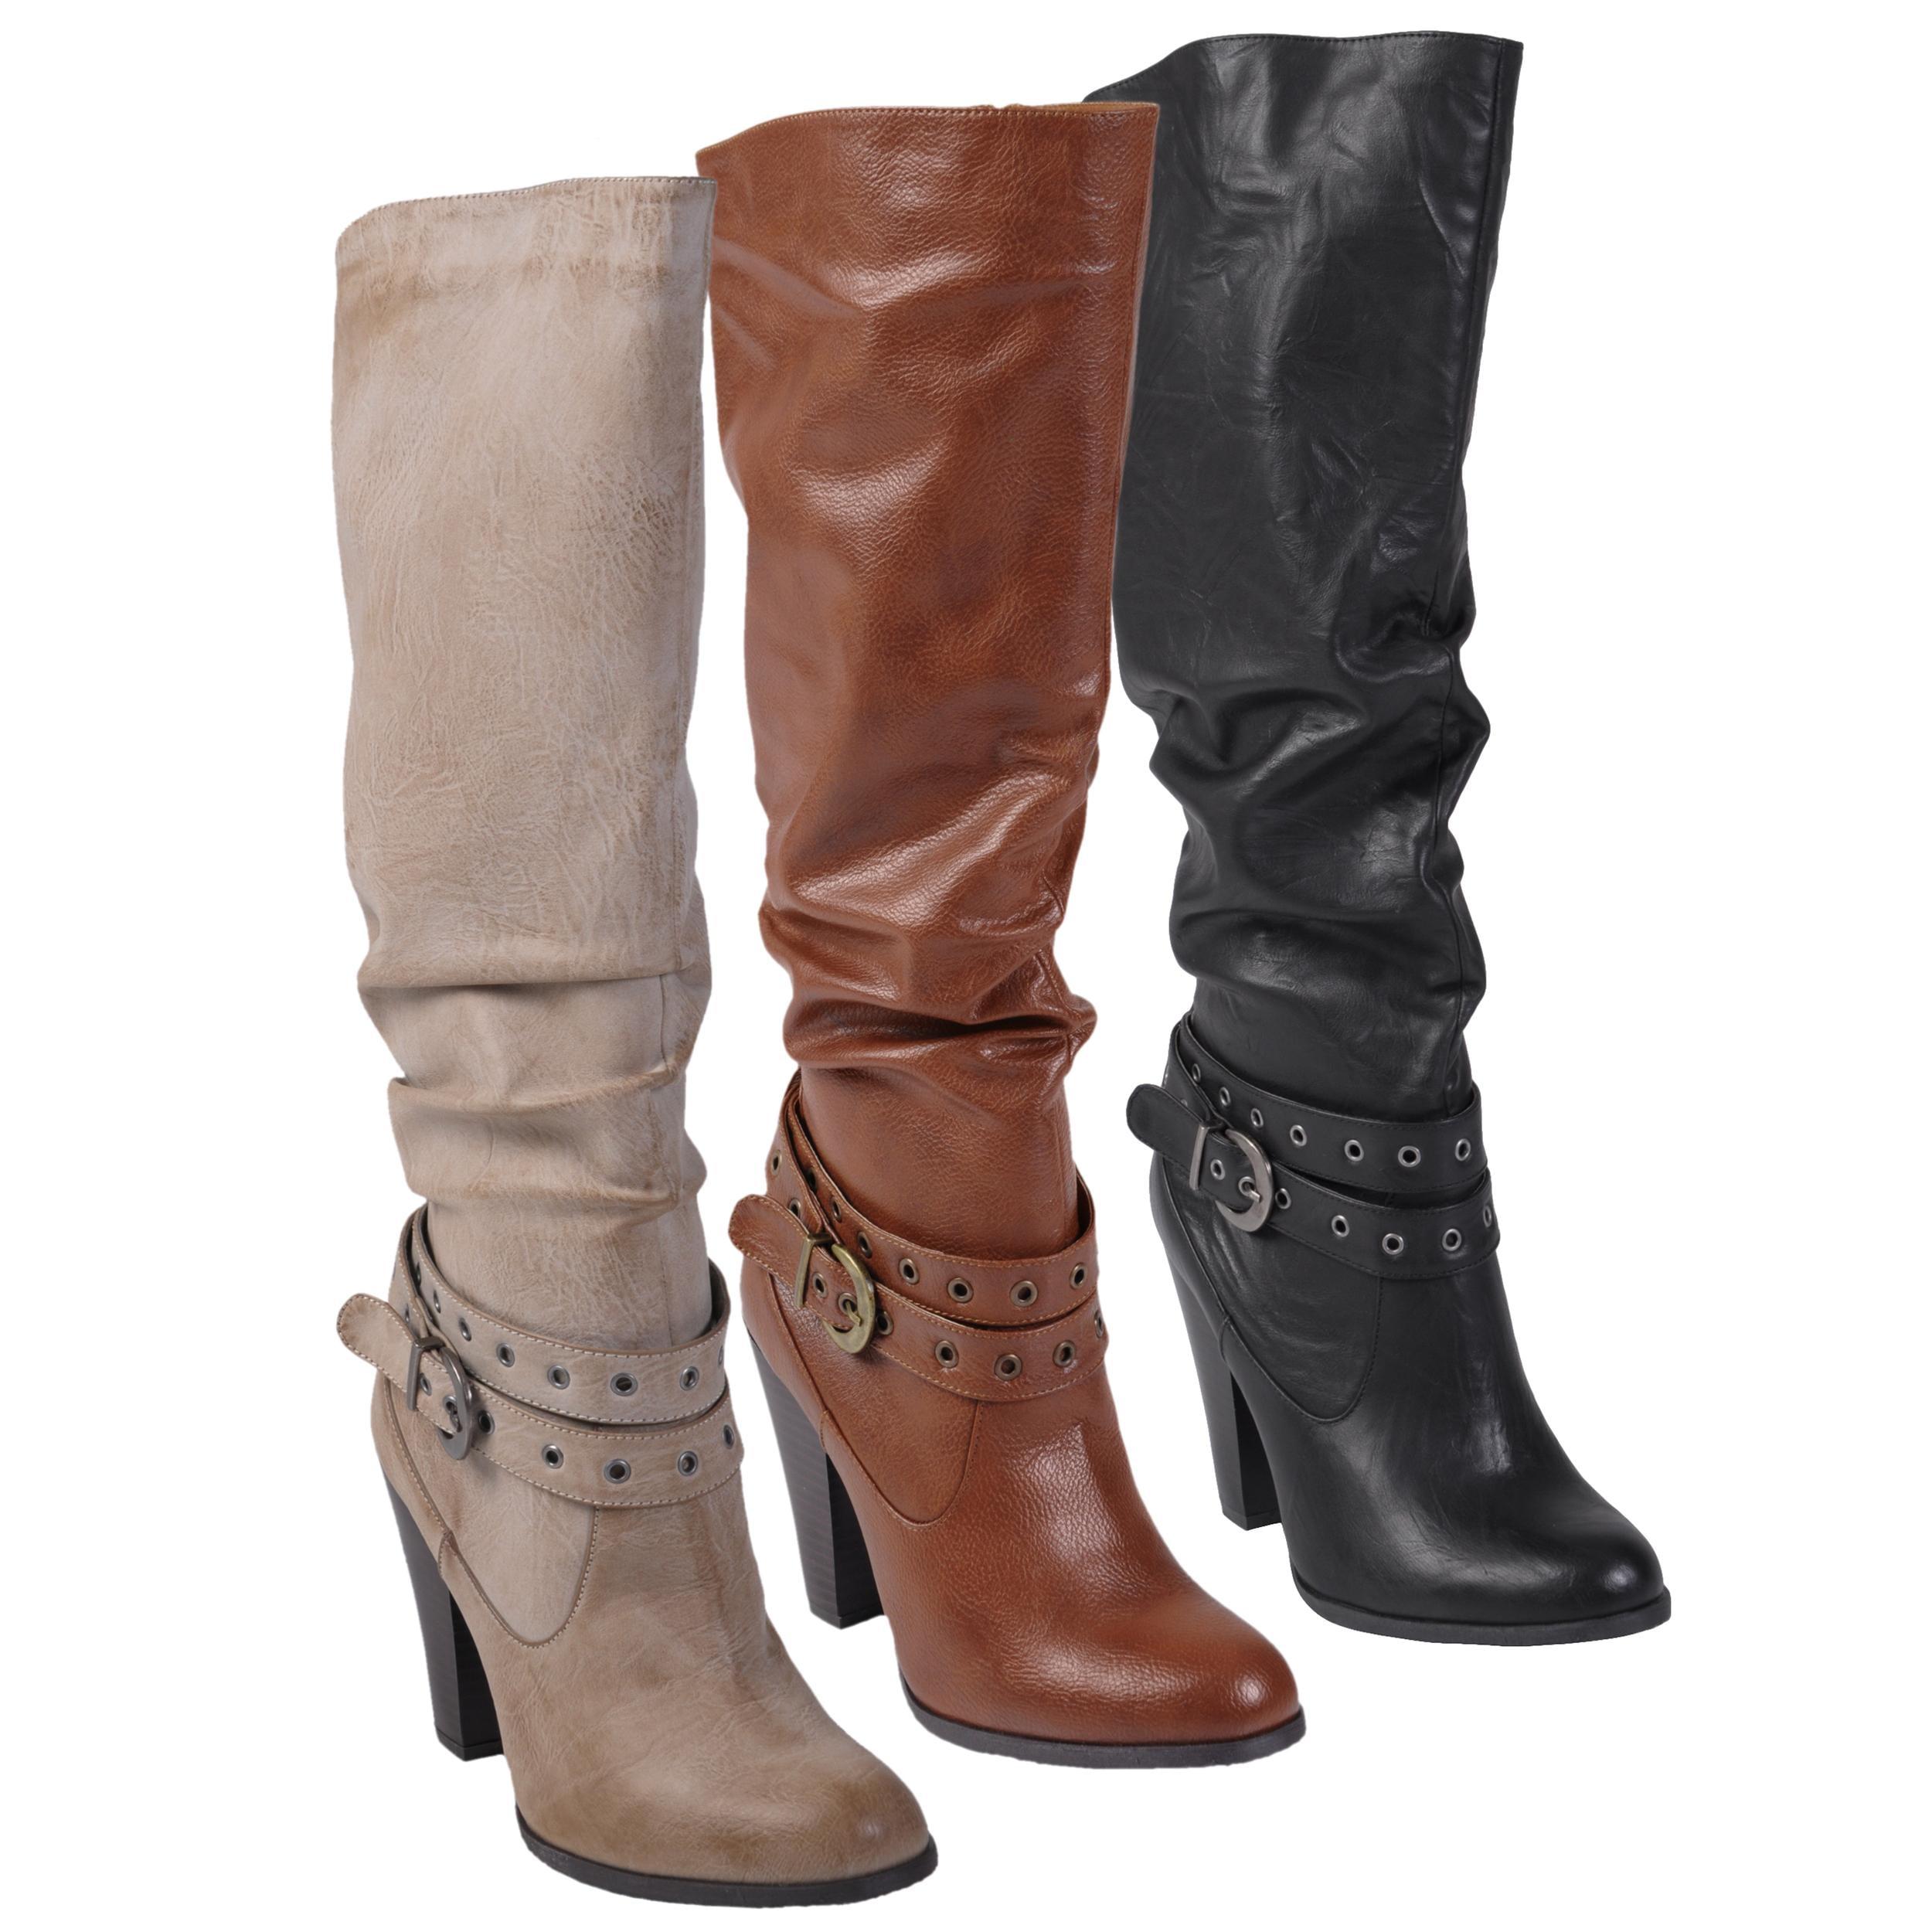 Journee Collection Women's 'ALADDIN-51' Buckle Accent High Heel Boot